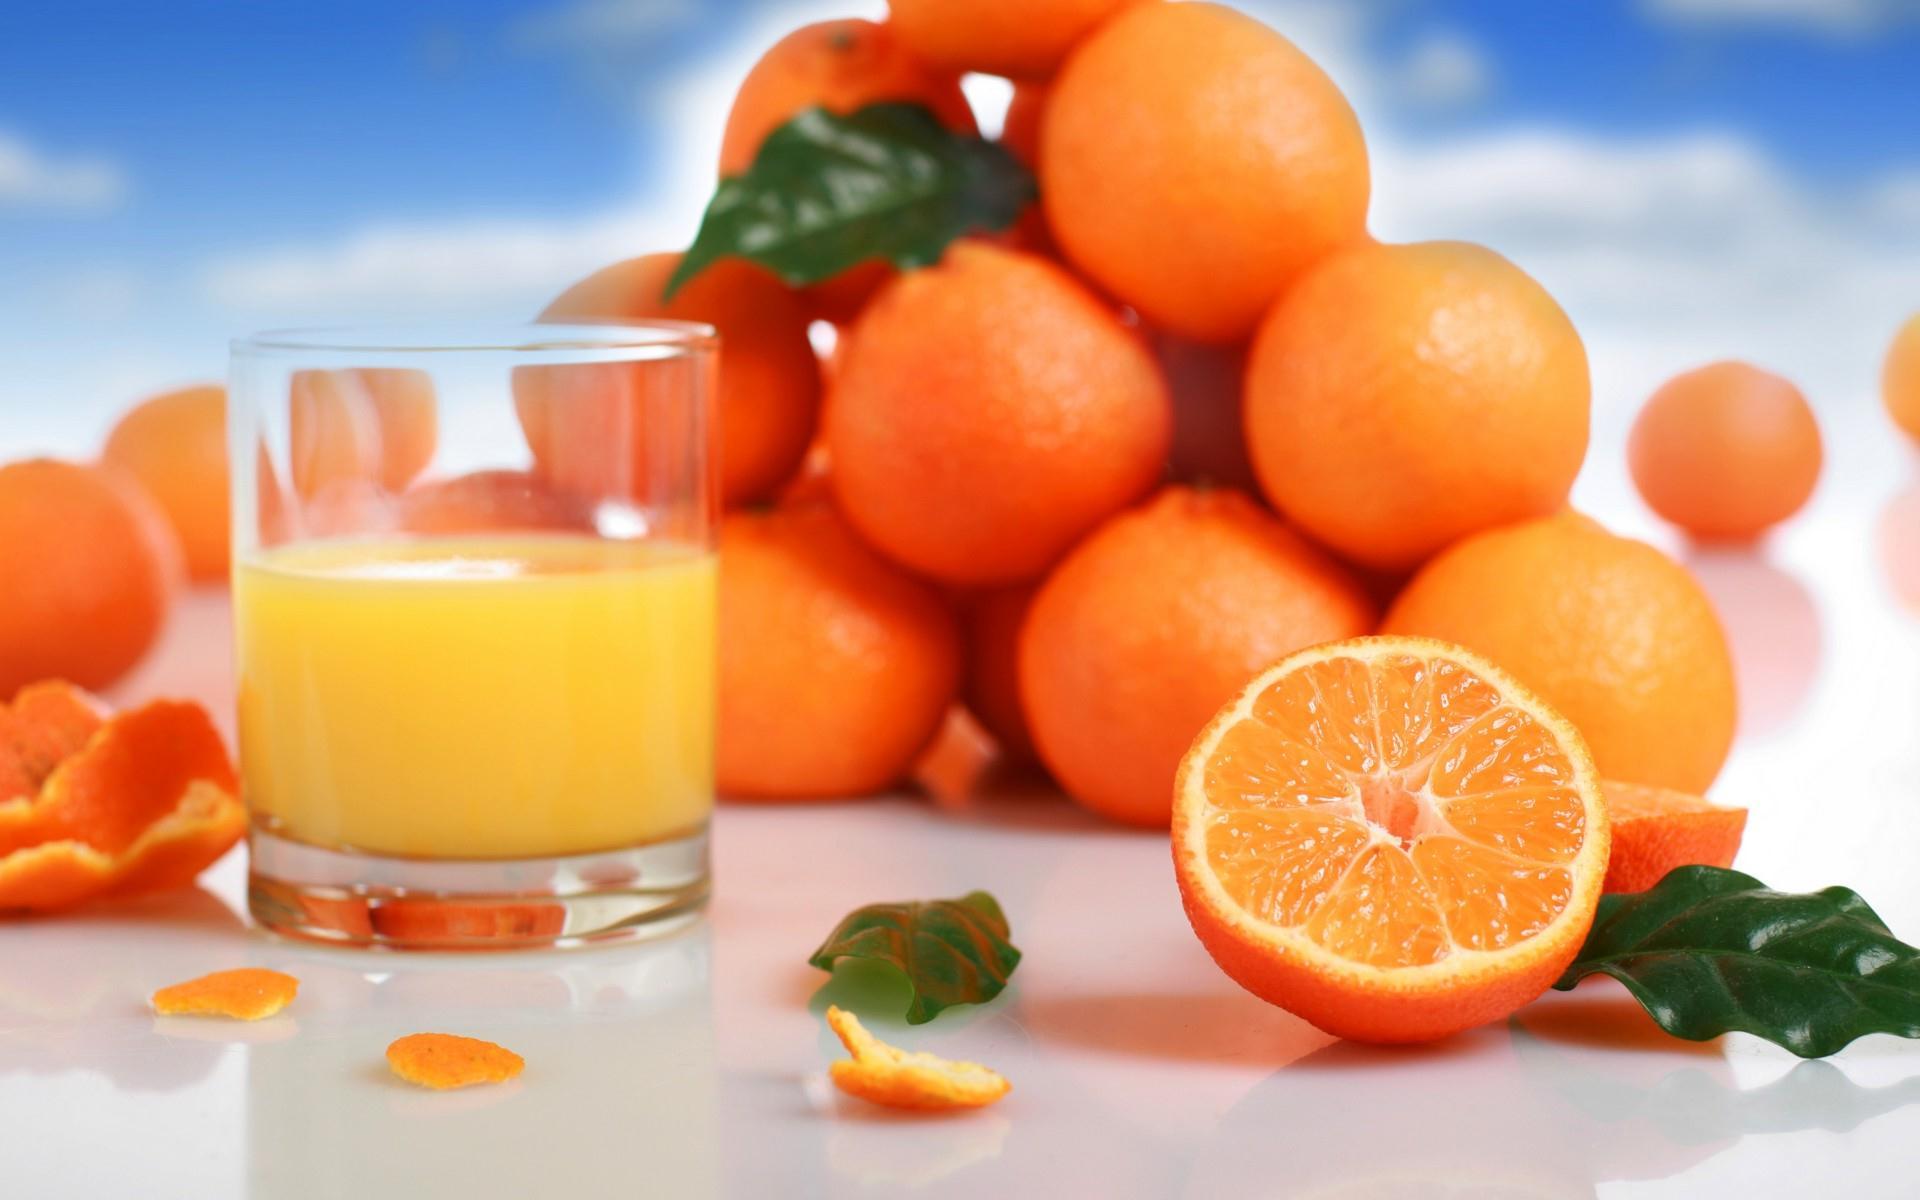 Best Orange Juice Wallpaper 4465 Wallpaper WallpaperLepi 1920x1200